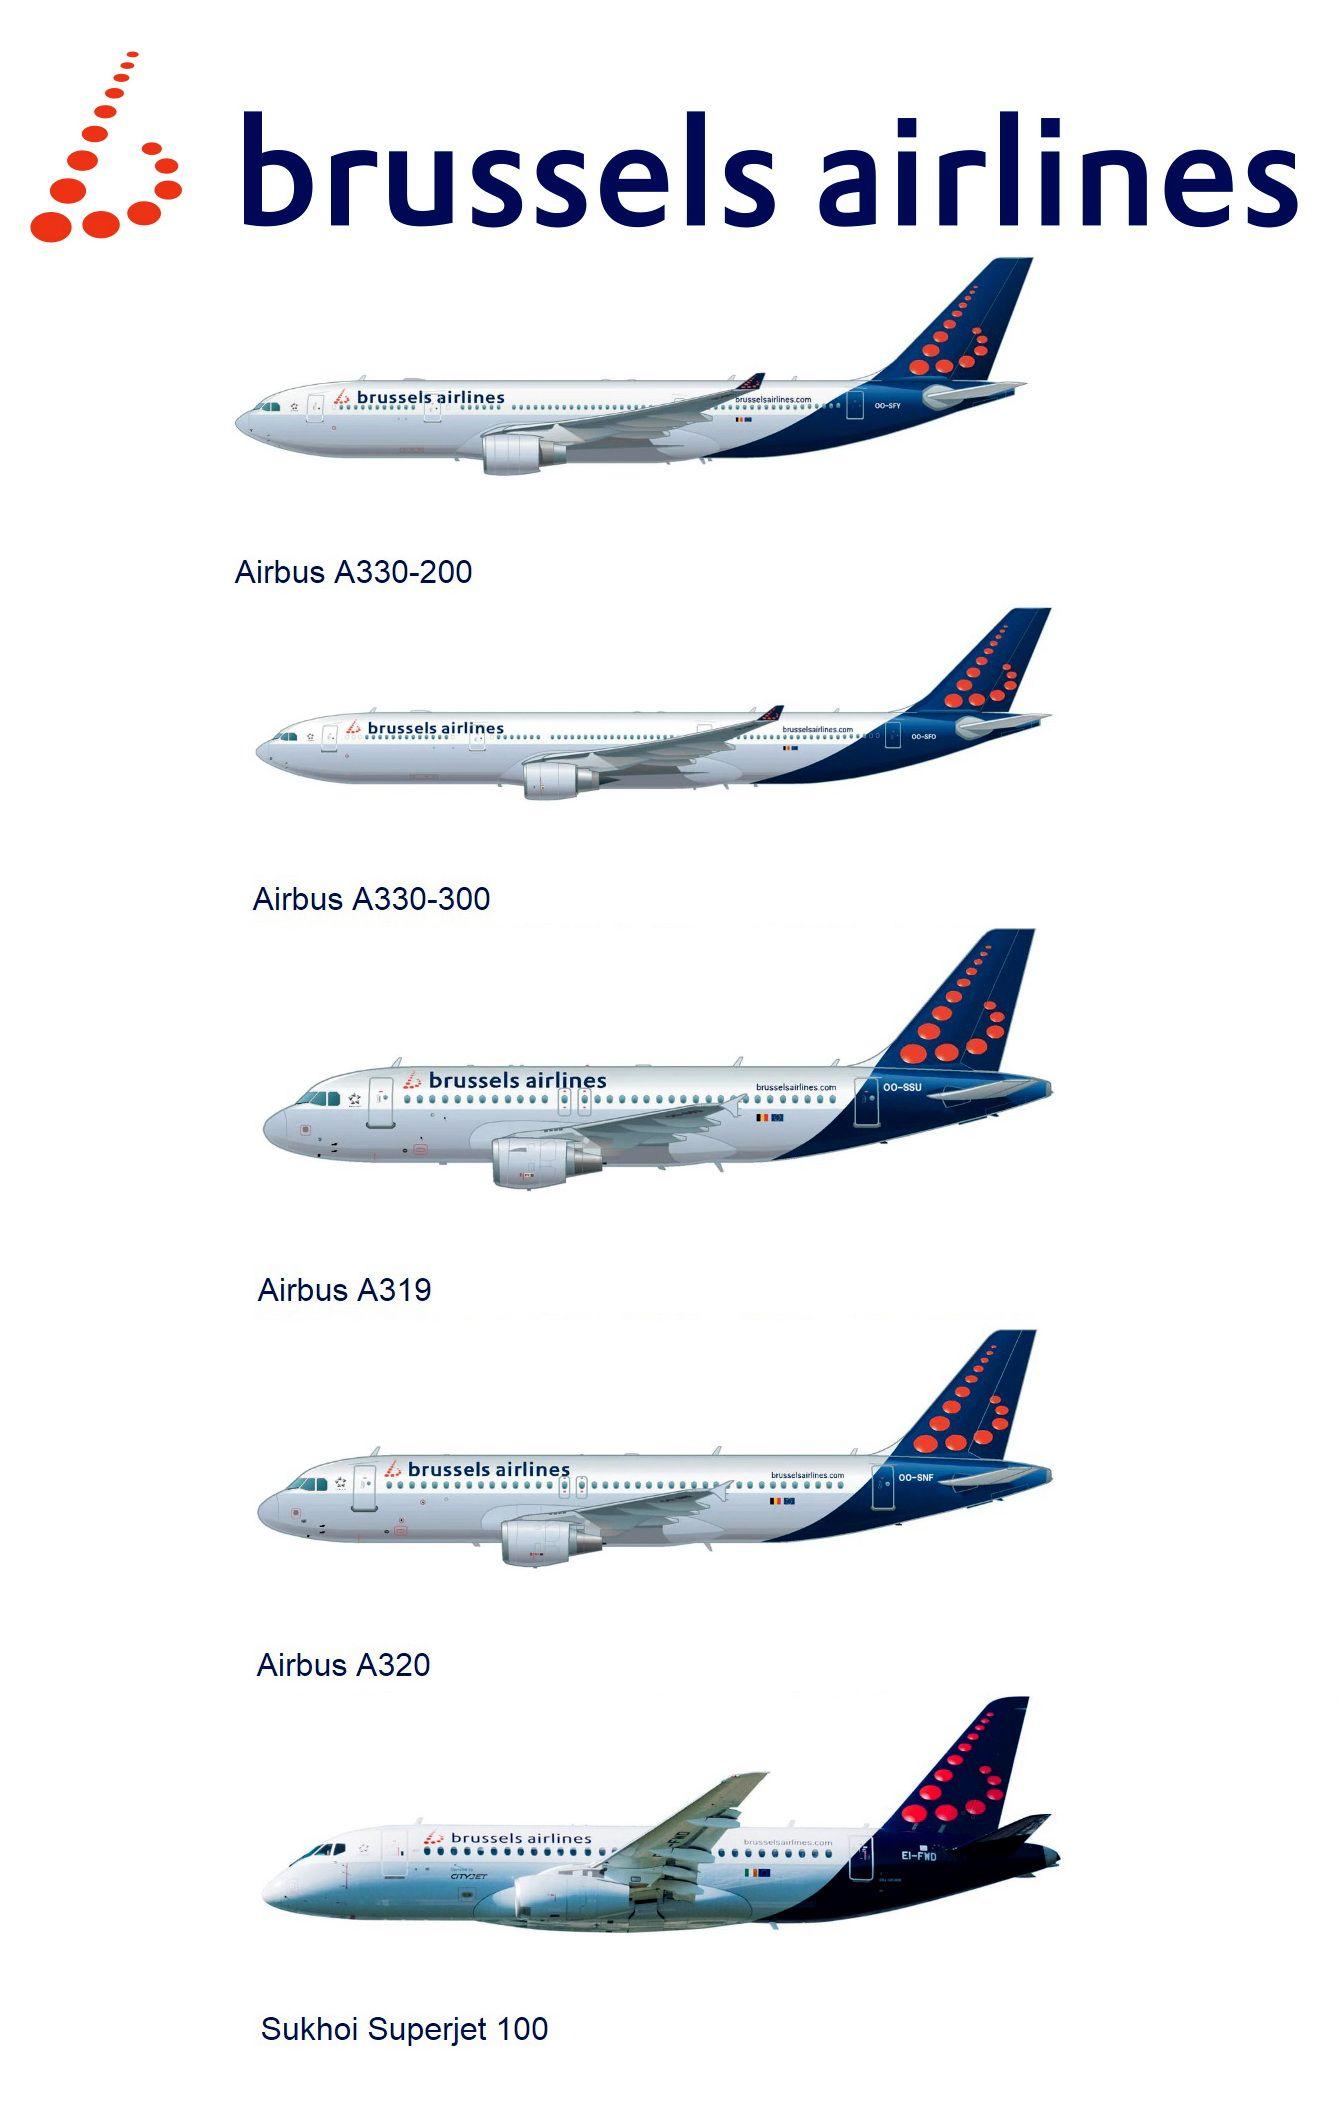 Brussels Airlines Fleet 2018   Airline Fleets   Civil aviation